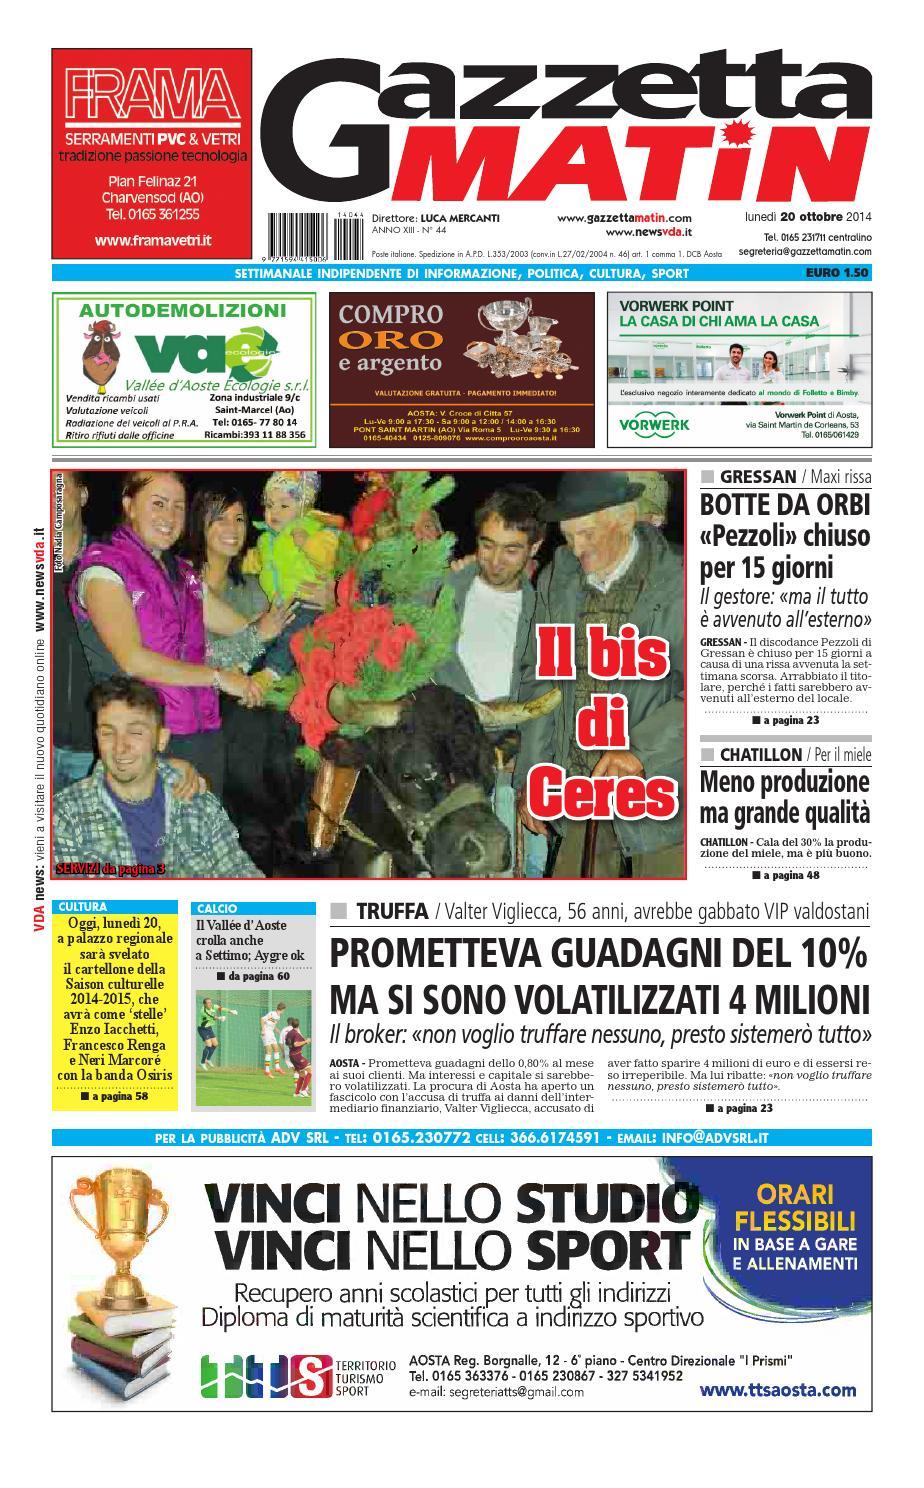 Gazzetta Matin Del 20 Ottobre 2014 By Newsvda Issuu